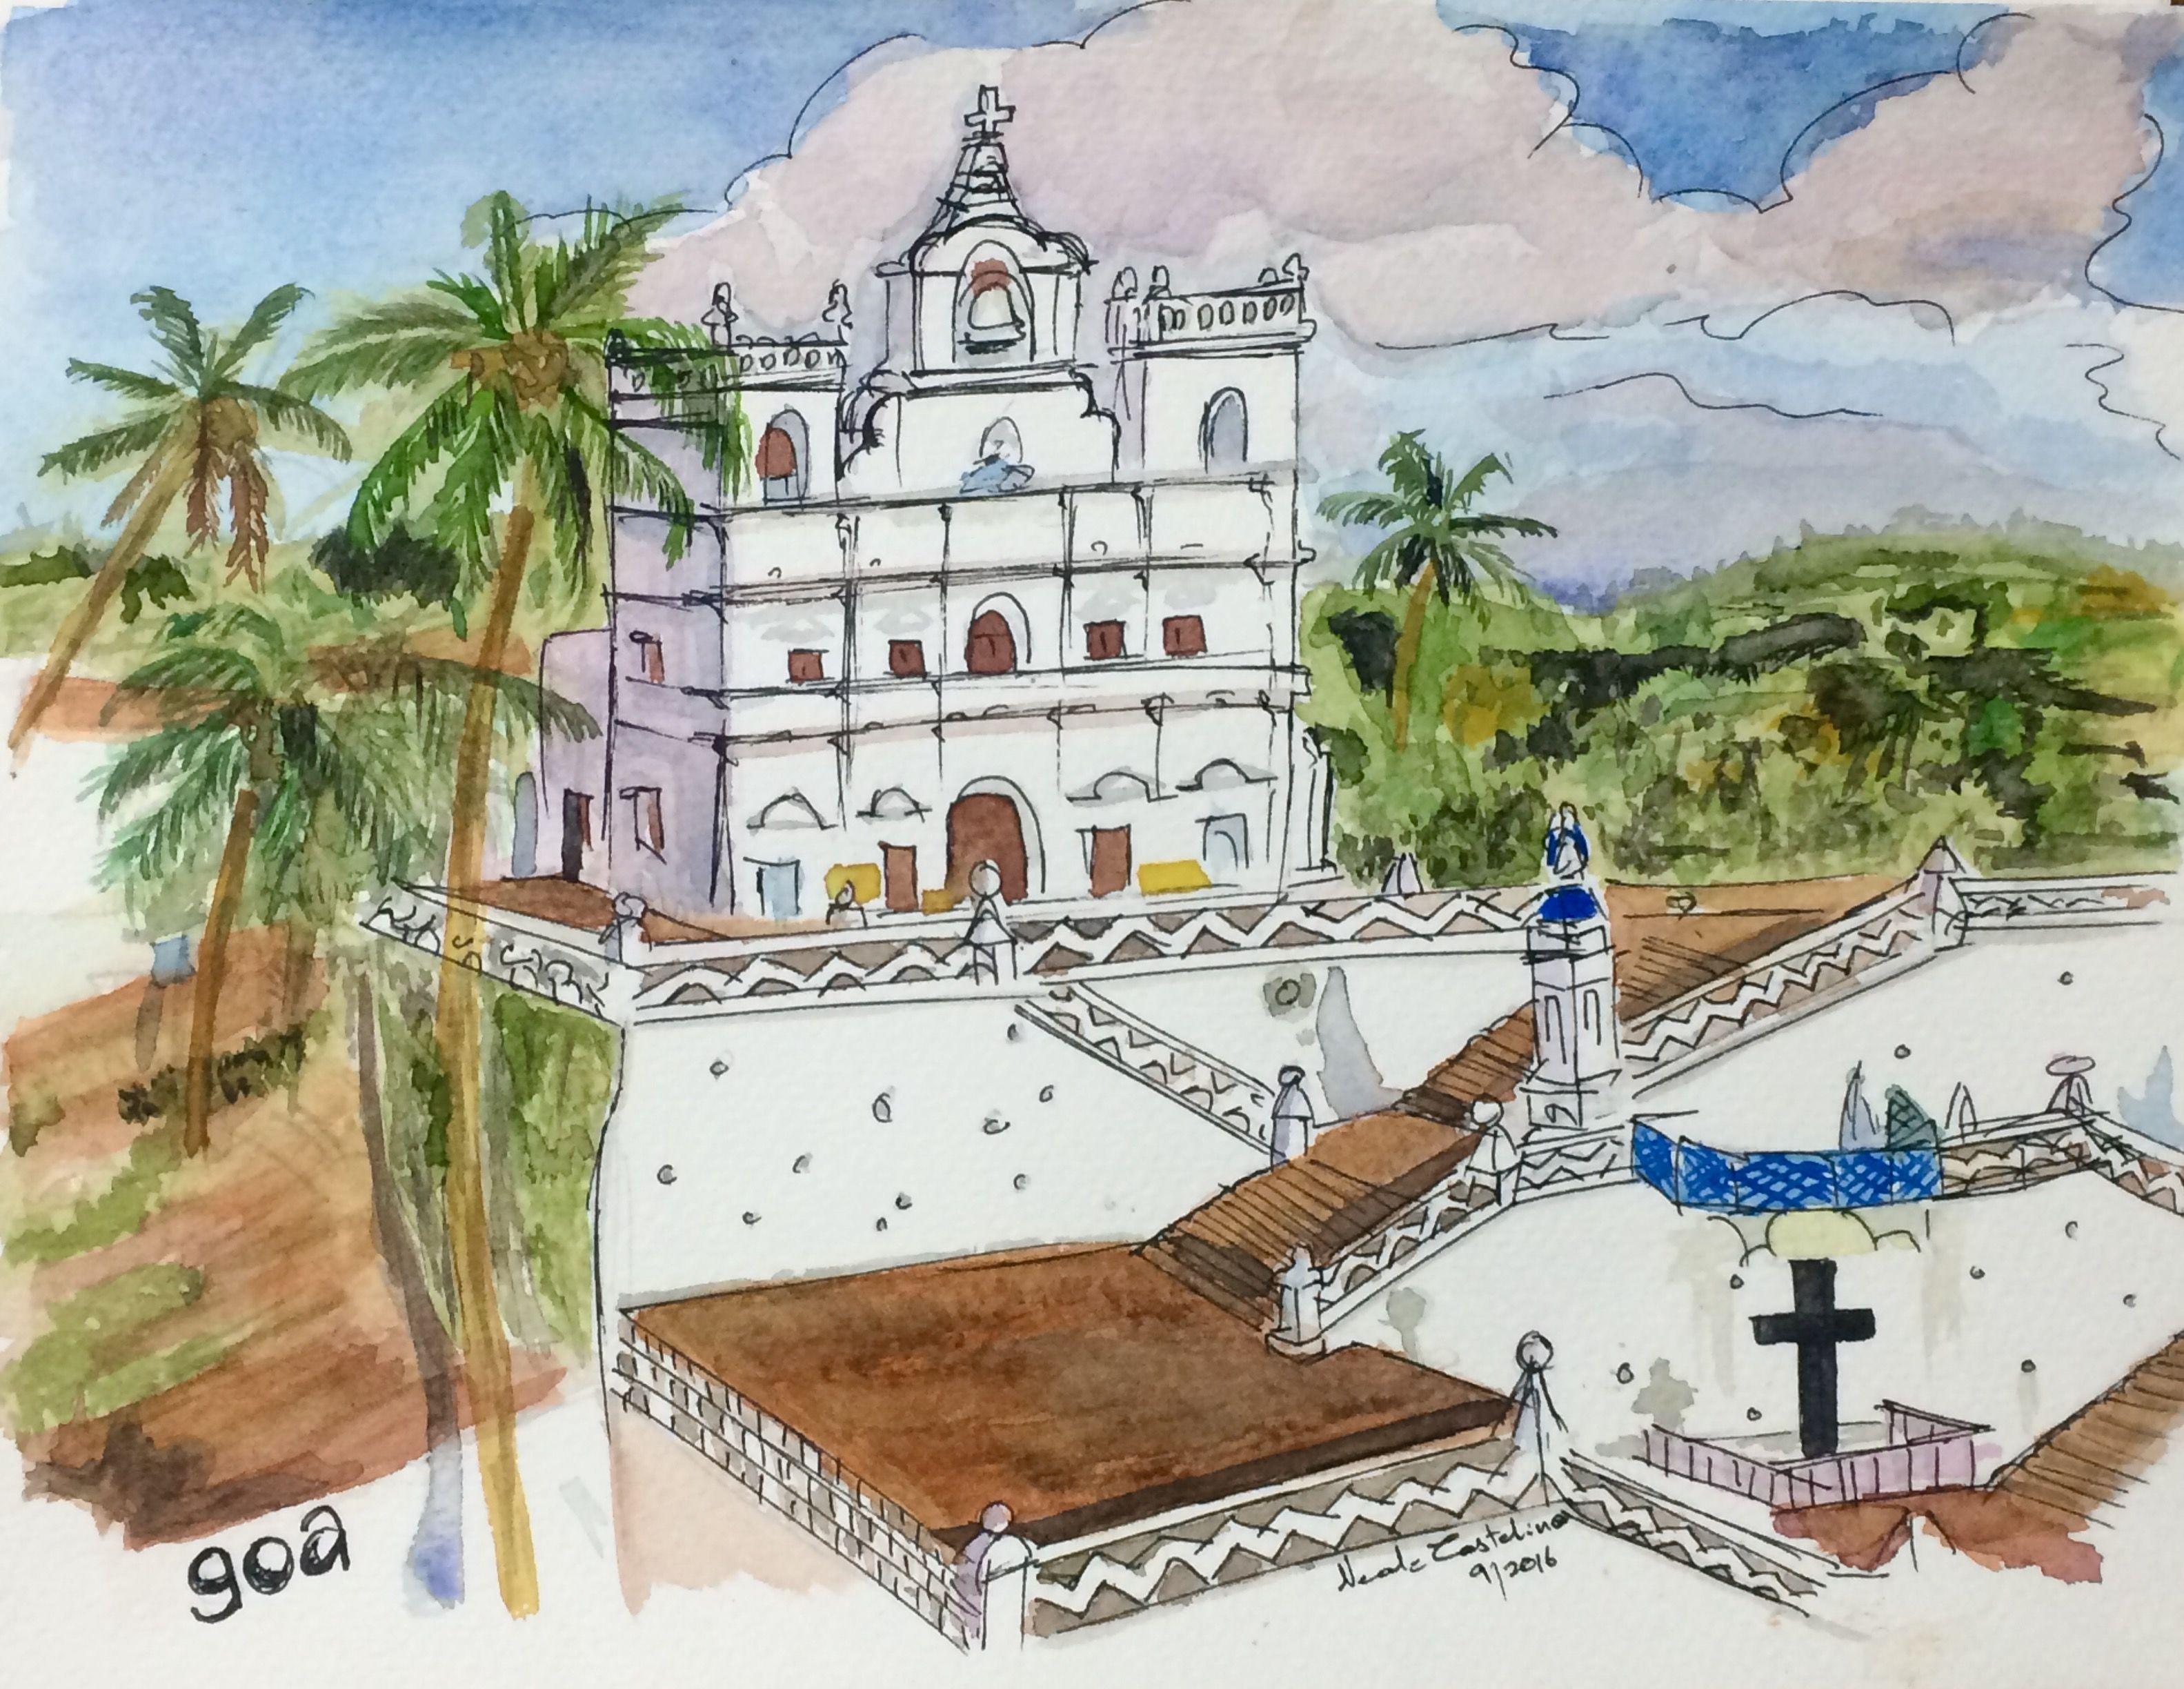 Watercolor artist magazine palm coast fl -  Watercolor Watercolorartist Watercolorpainting Mumbai Nealecastelinoart Blueberry Nealecastelino Letscreateart